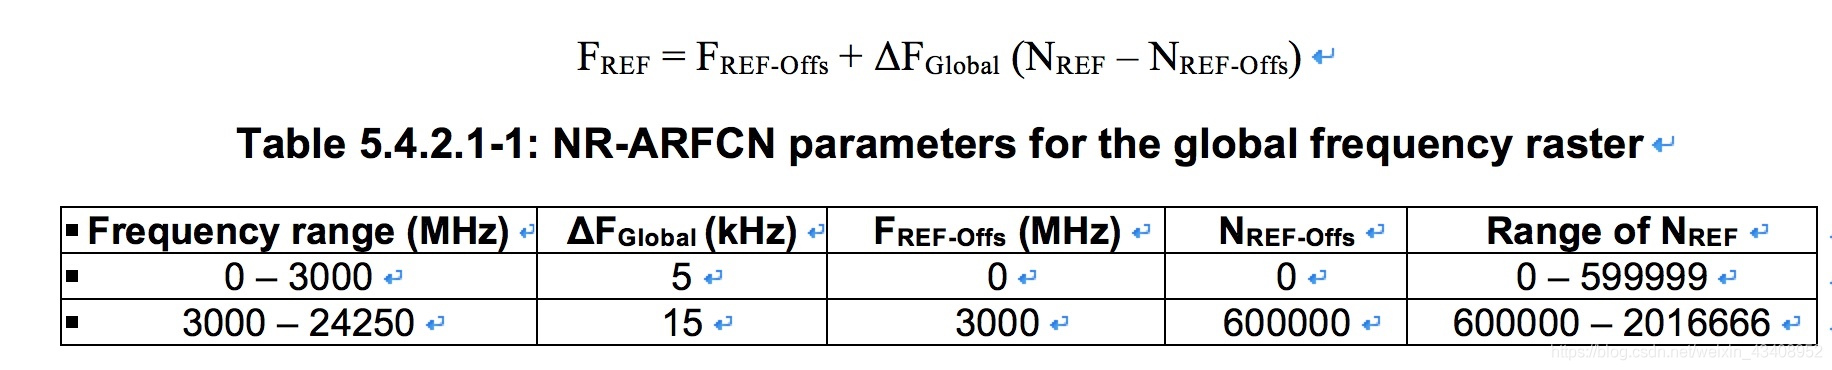 5G NR 频率计算解析- weixin_43408952的博客- CSDN博客